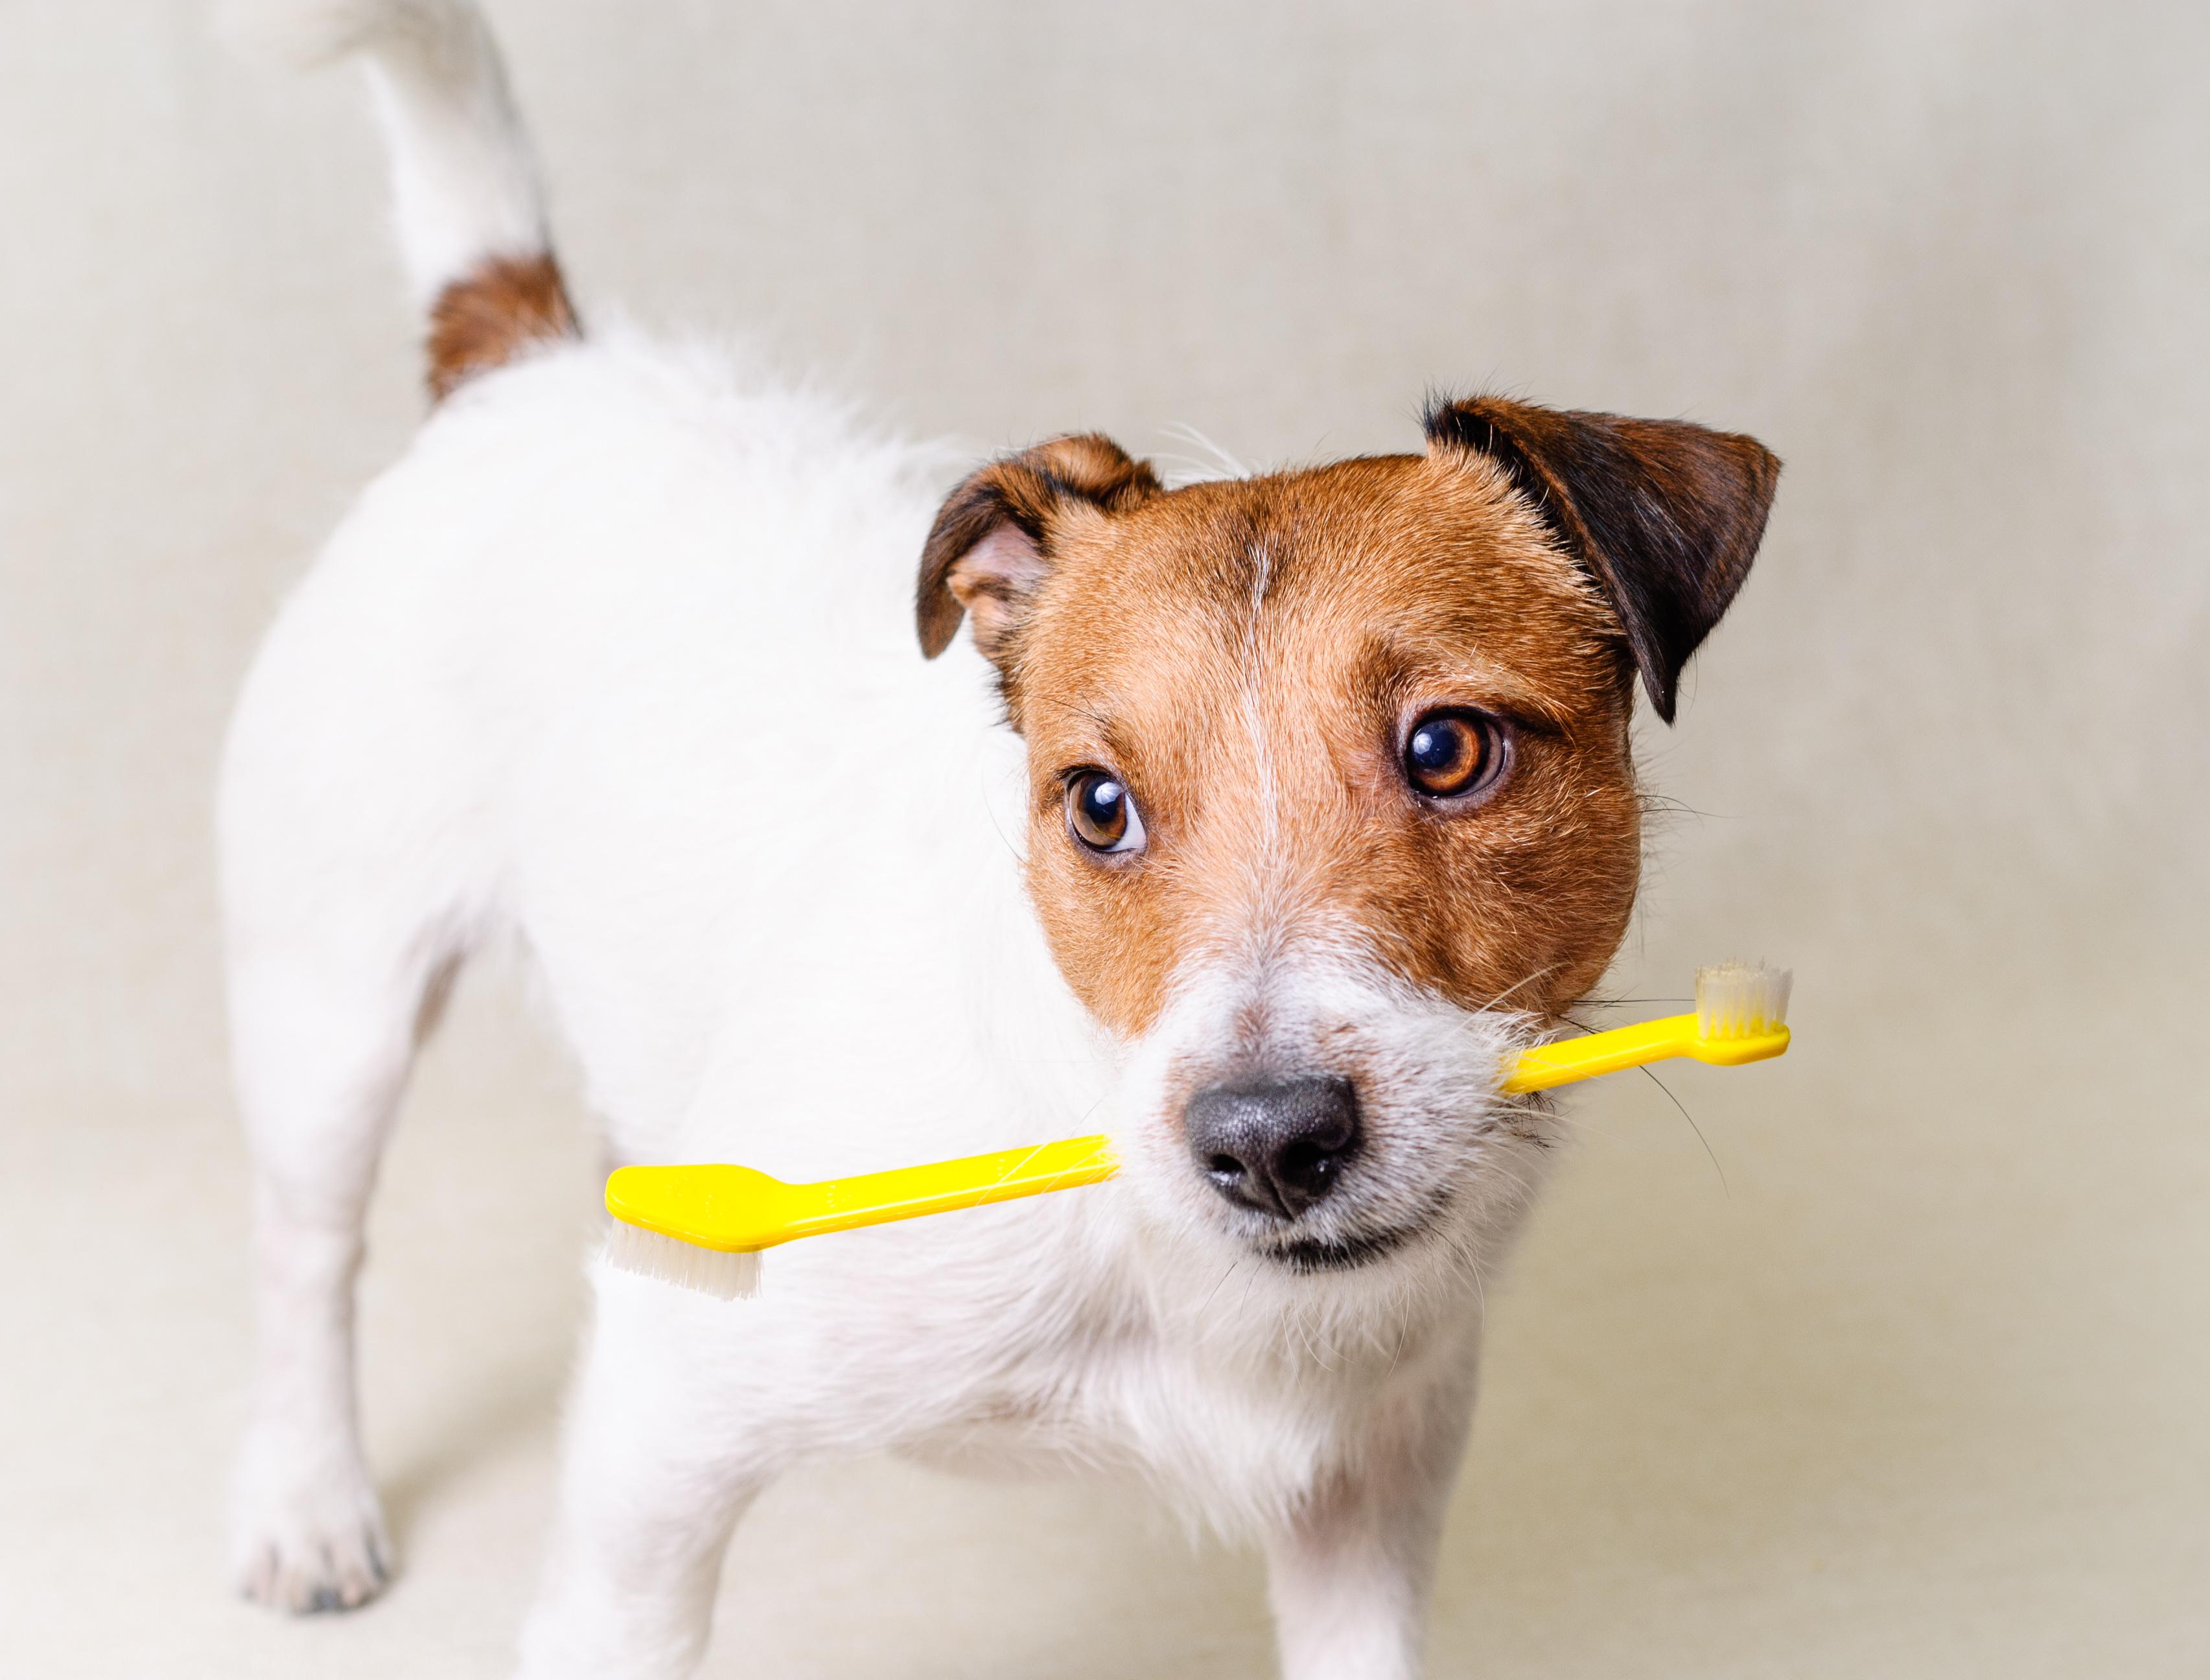 How to brush teeth dog Ultrasonic cleaning of teeth: reviews 55